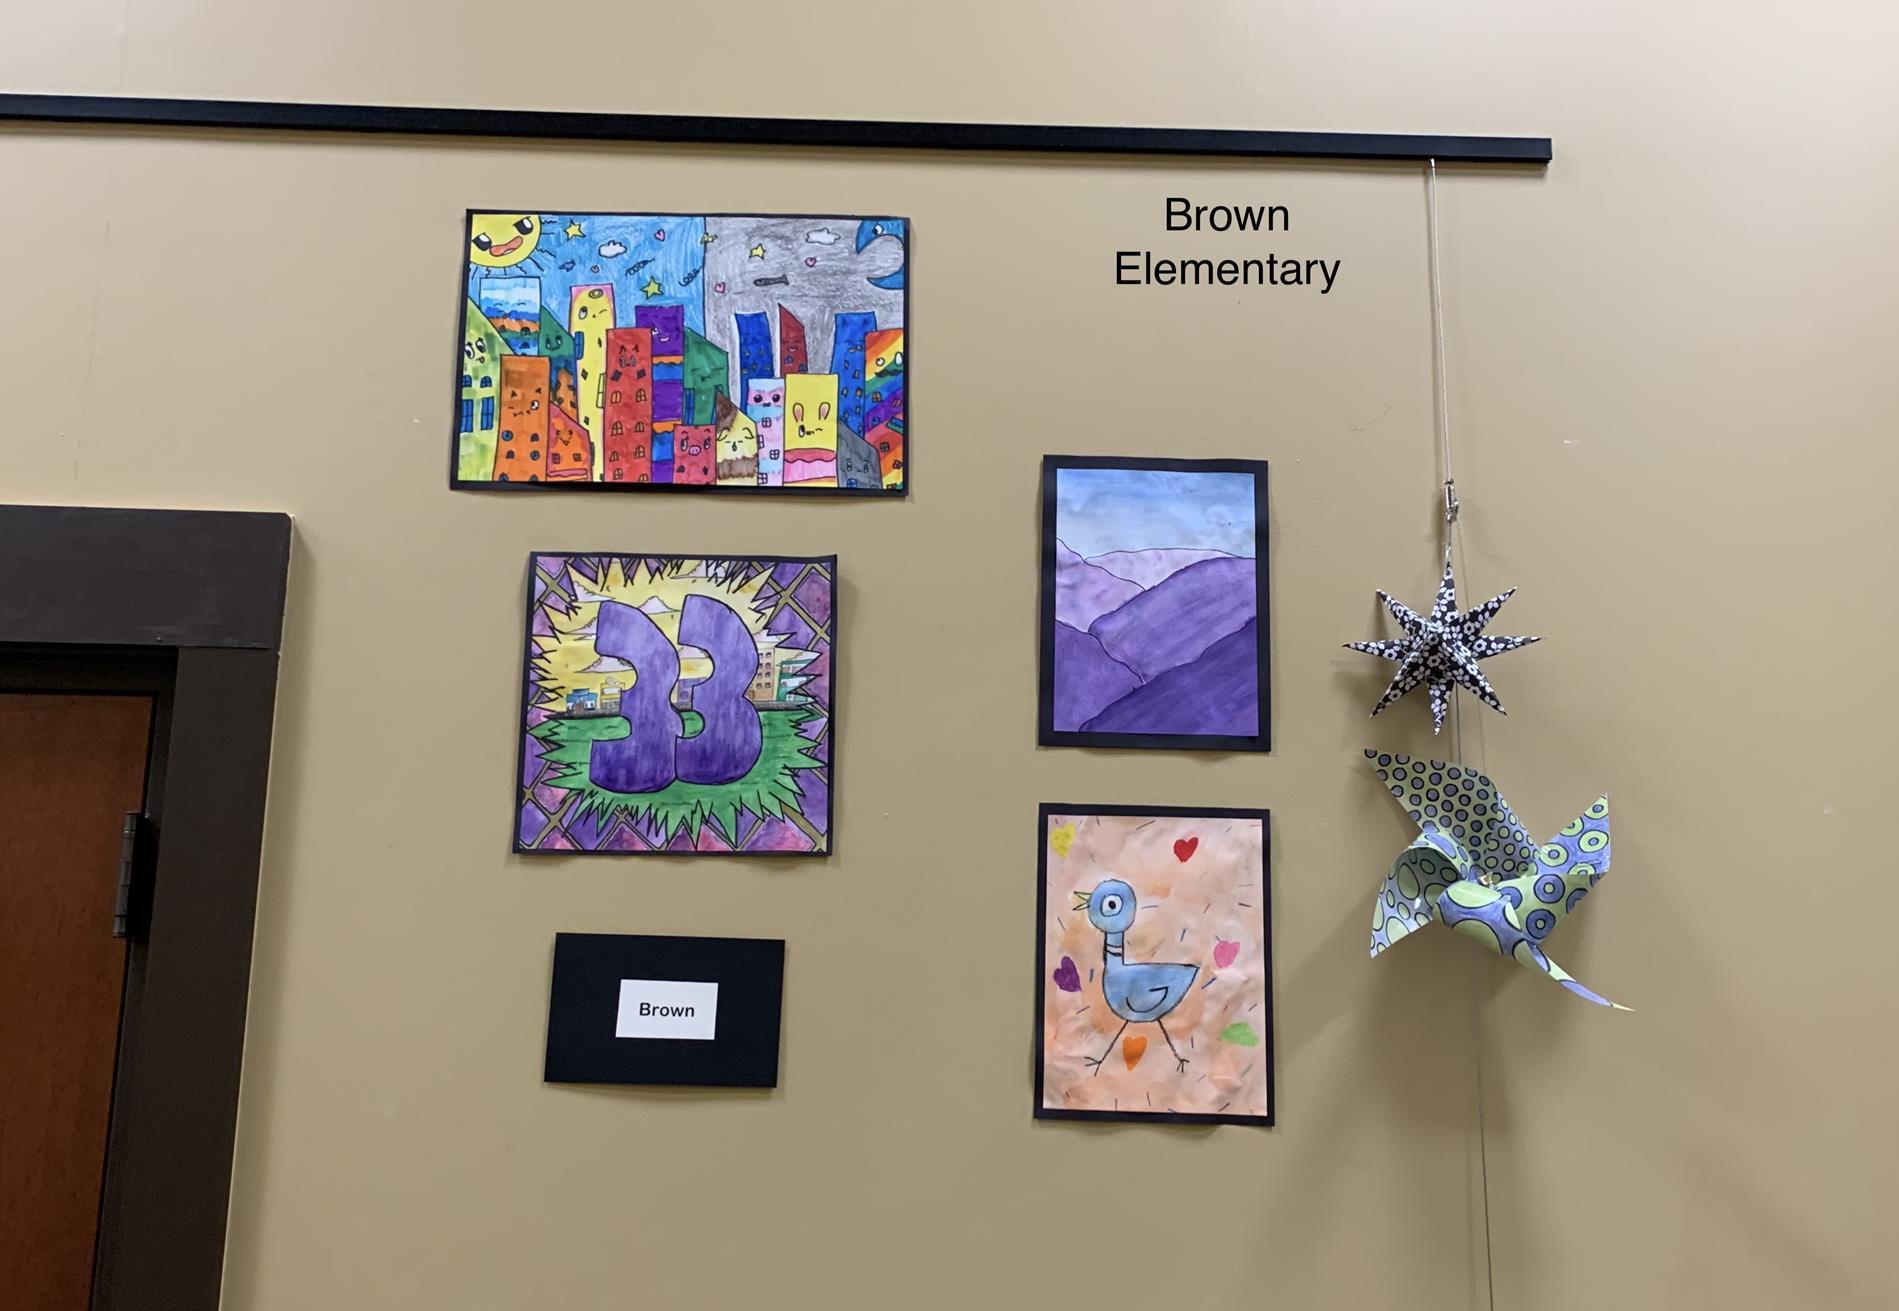 Brown Elementary Art Work